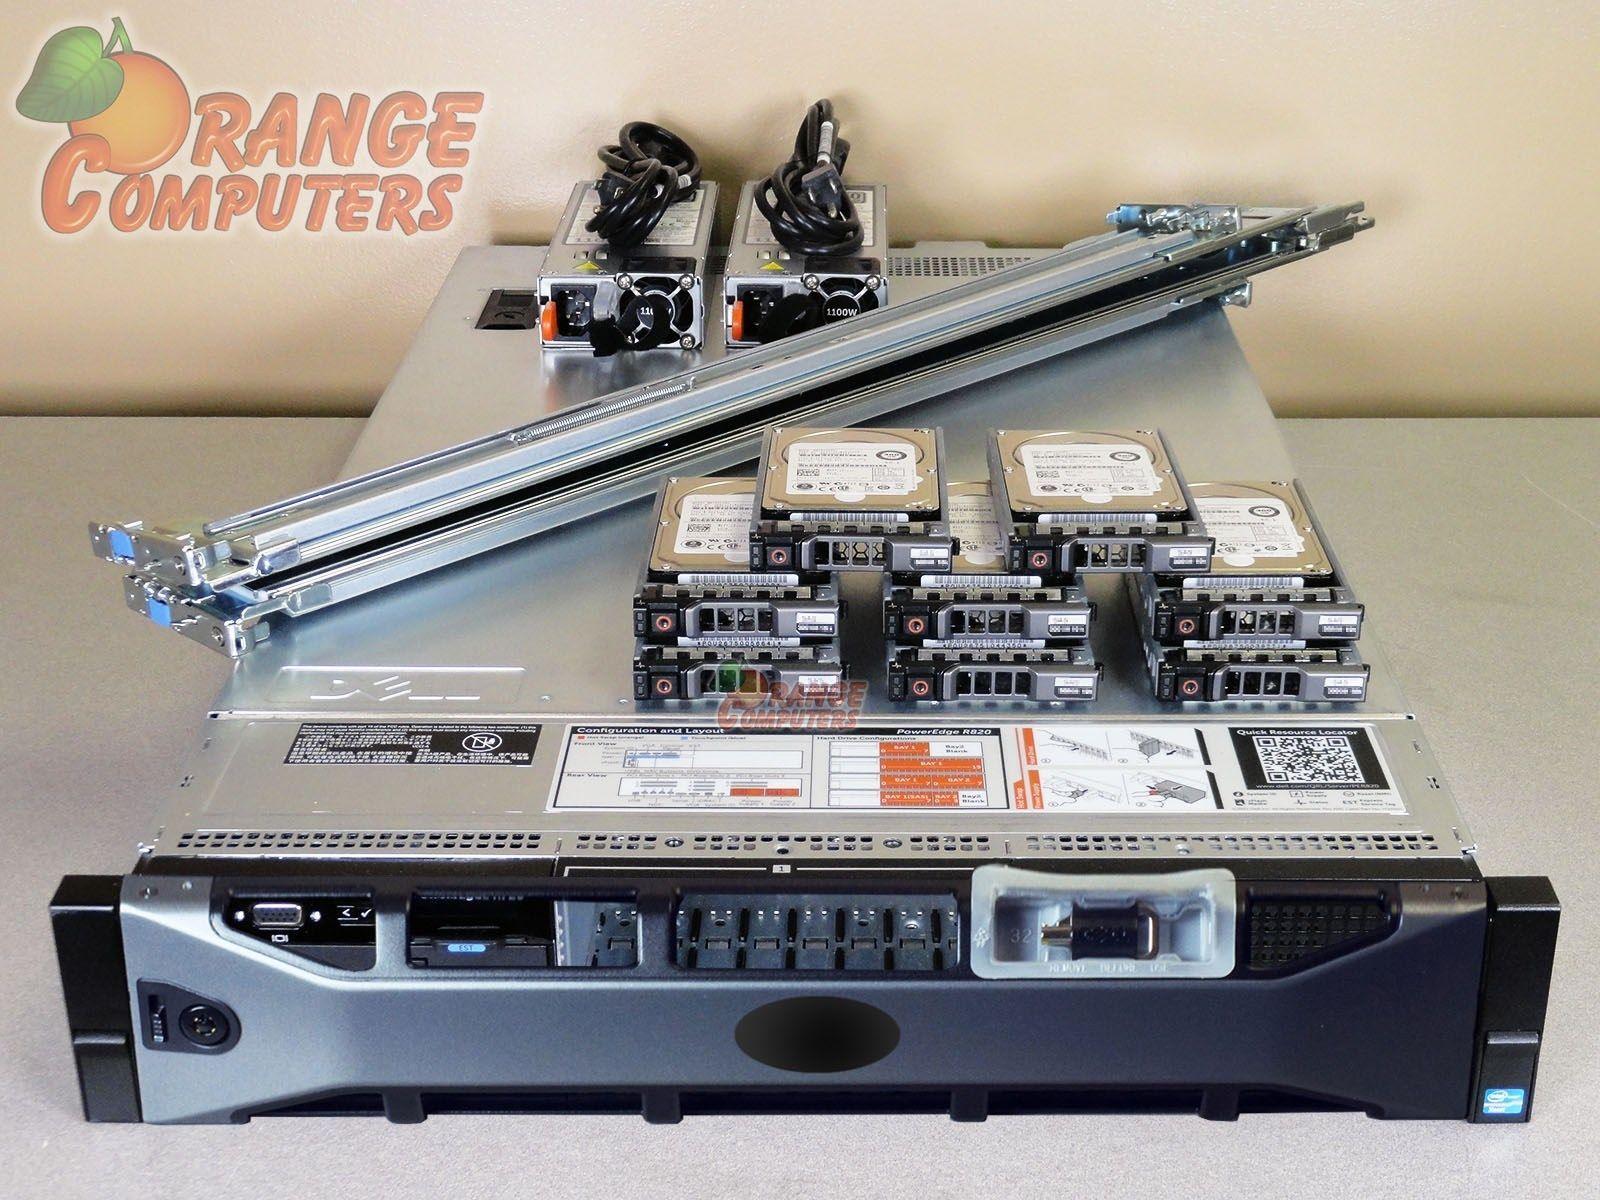 Dell R820 iDRAC Four E5-4617 6C2 9GHz 1024GB 6x 1 2TB 2x